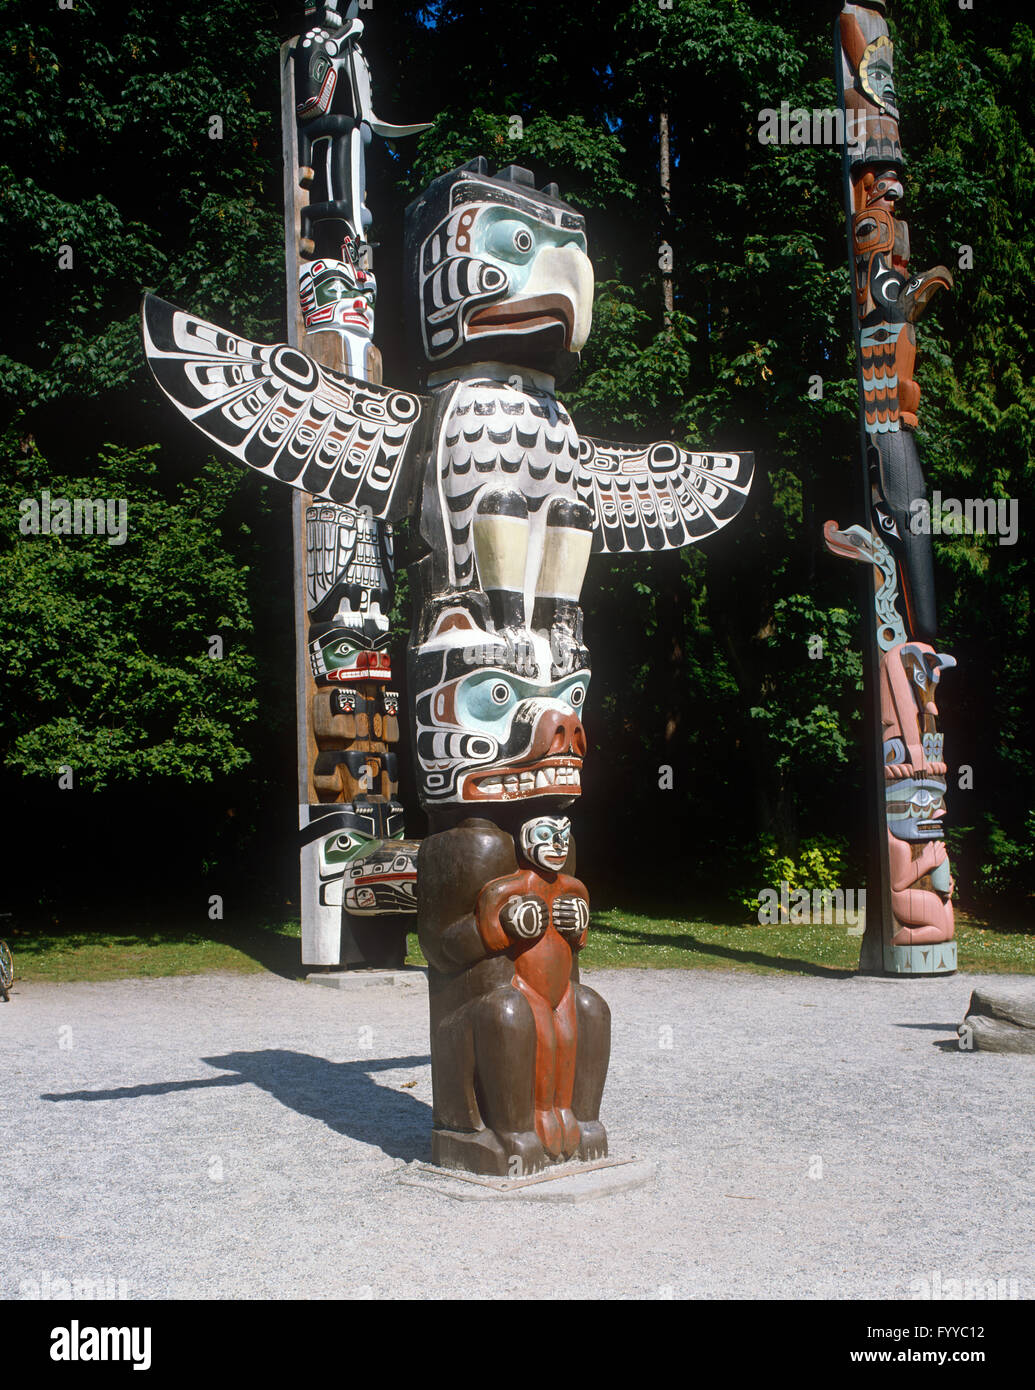 Red cedar wood Totem pole, outside. - Stock Image